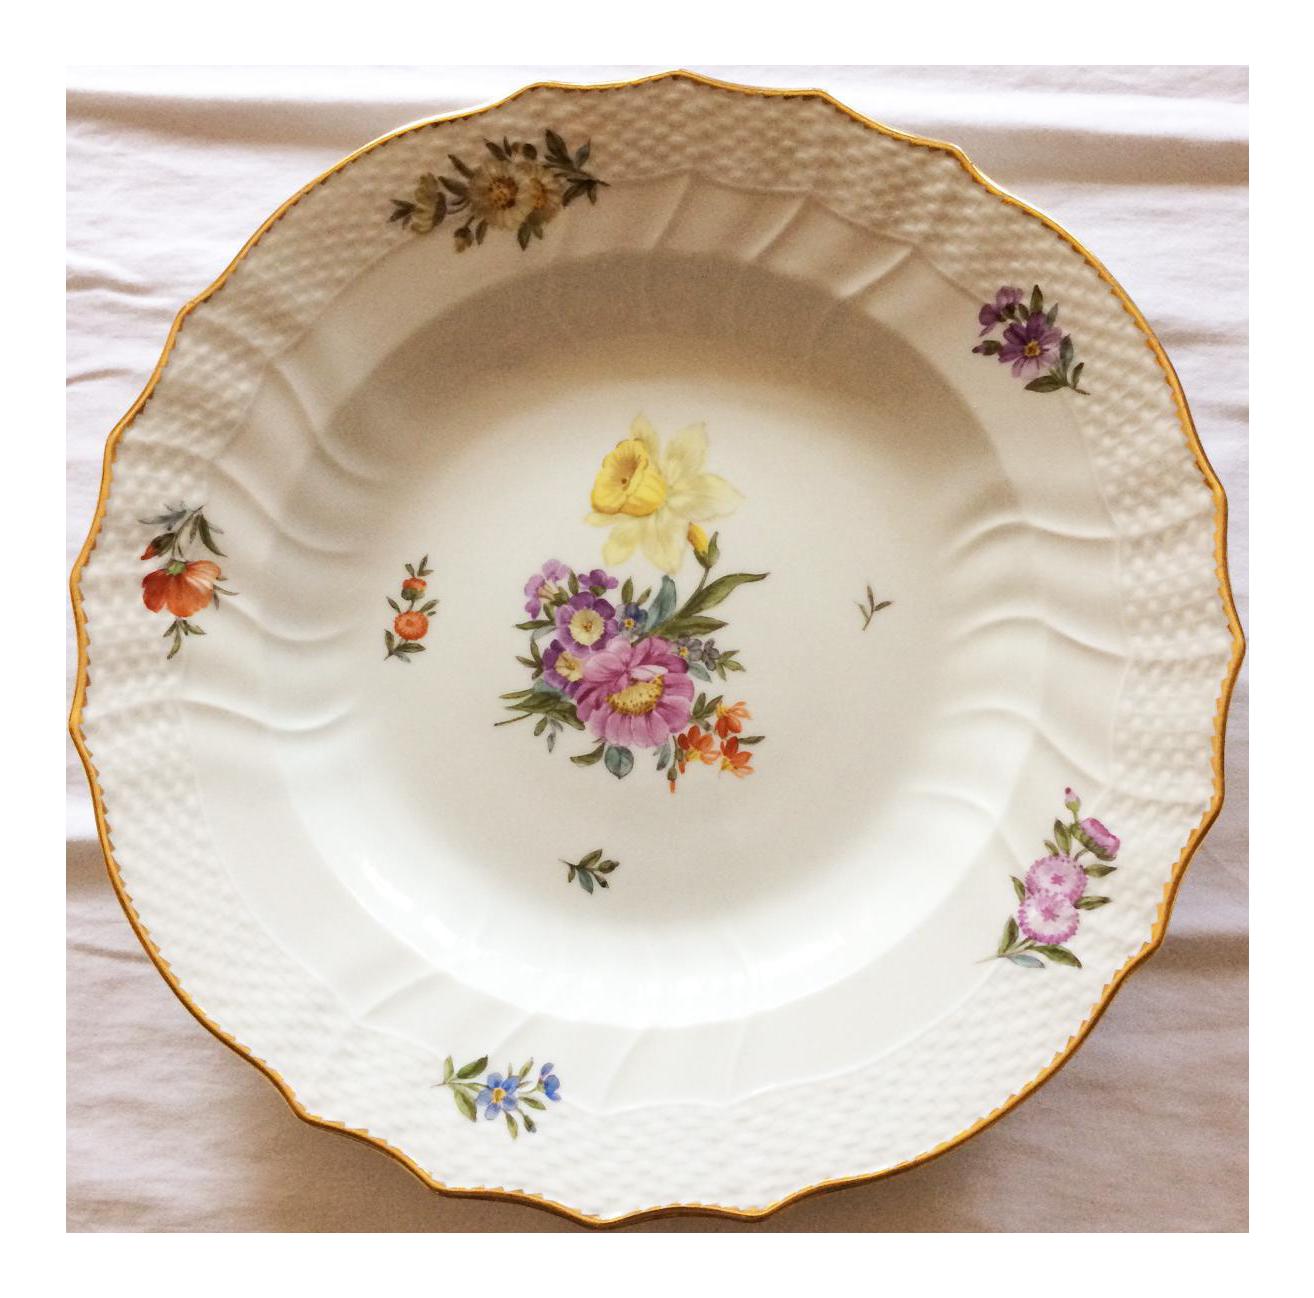 sc 1 st  Chairish & Saxon Flower Royal Copenhagen Dinner Plates - Set of 6 | Chairish